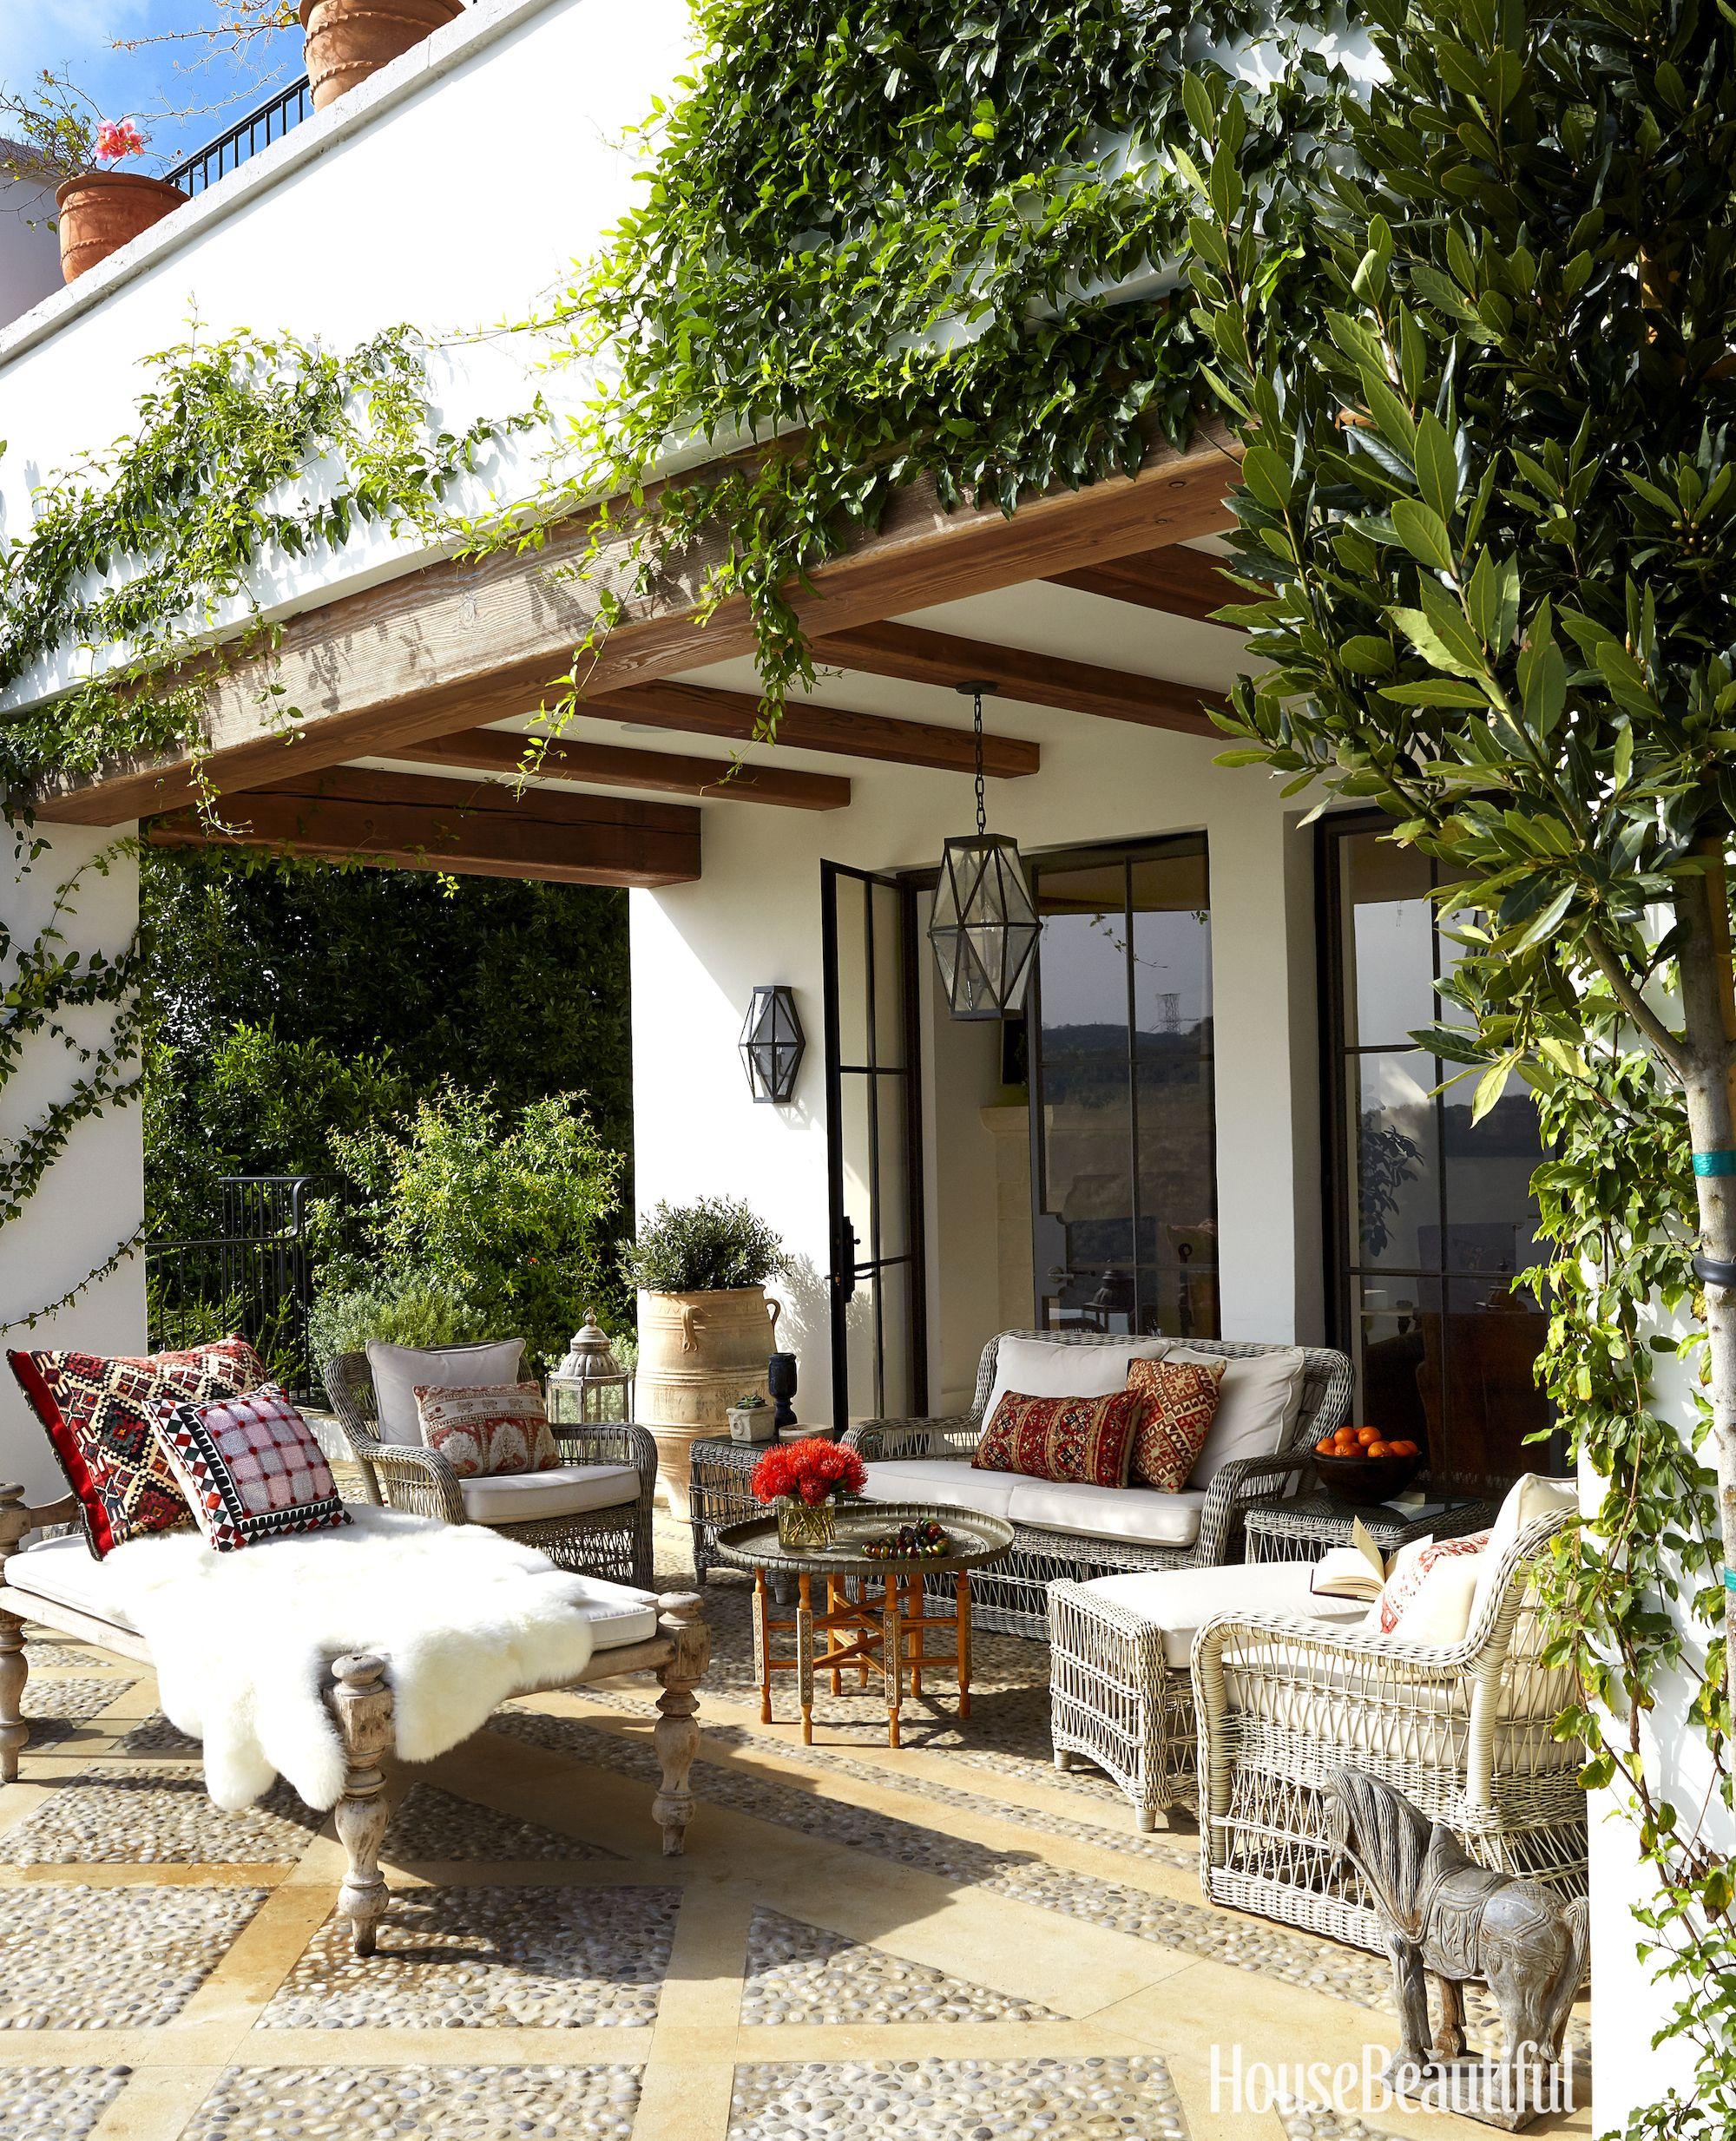 40 best patio ideas for 2019 stylish outdoor patio design ideas rh housebeautiful com outdoor patio ideas with stone outdoor patio ideas diy